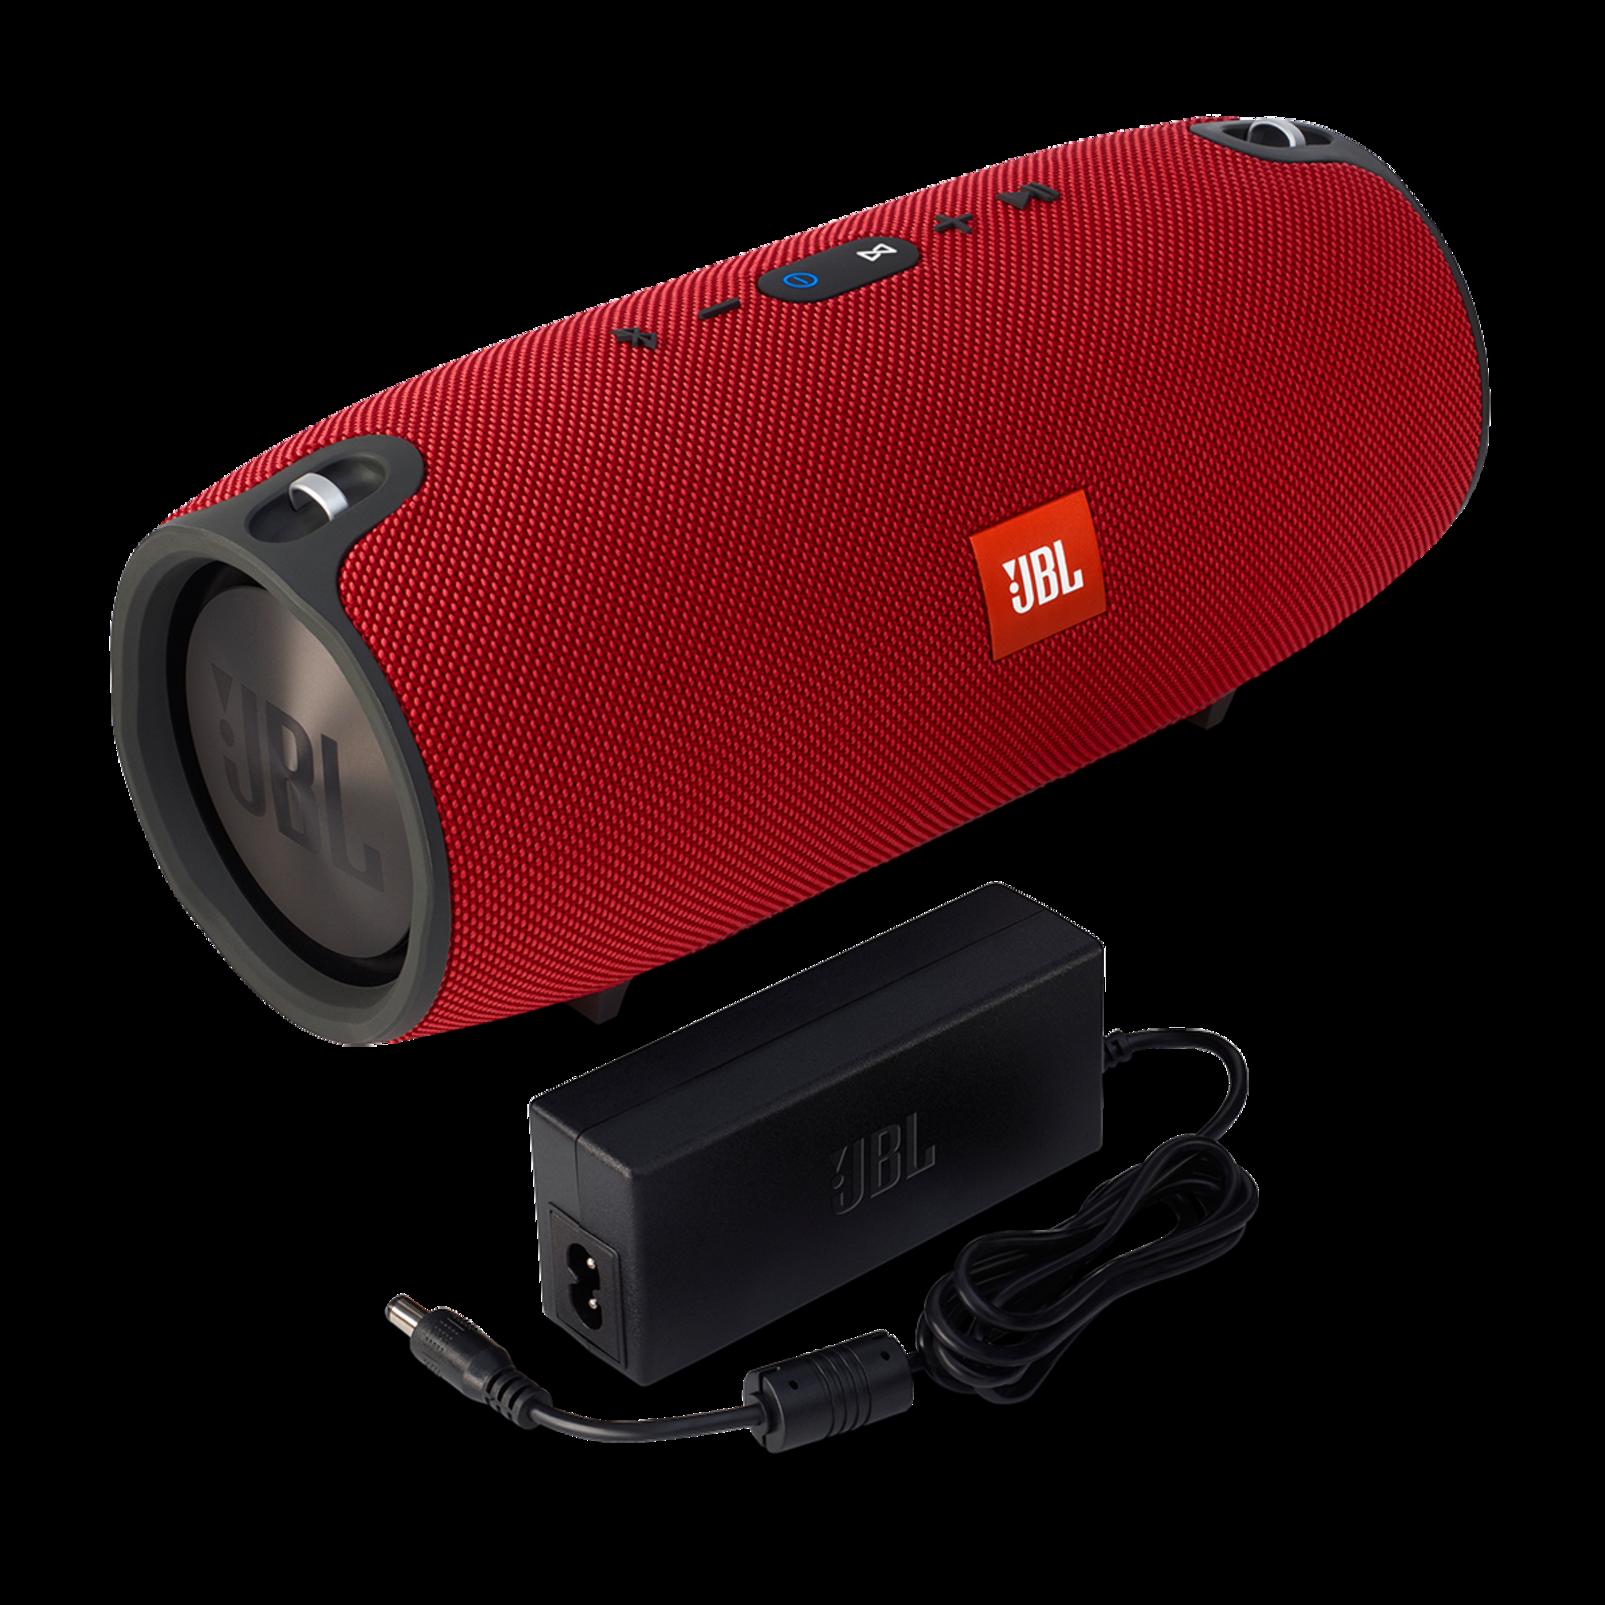 JBL Xtreme - Red - Splashproof portable speaker with ultra-powerful performance - Detailshot 1